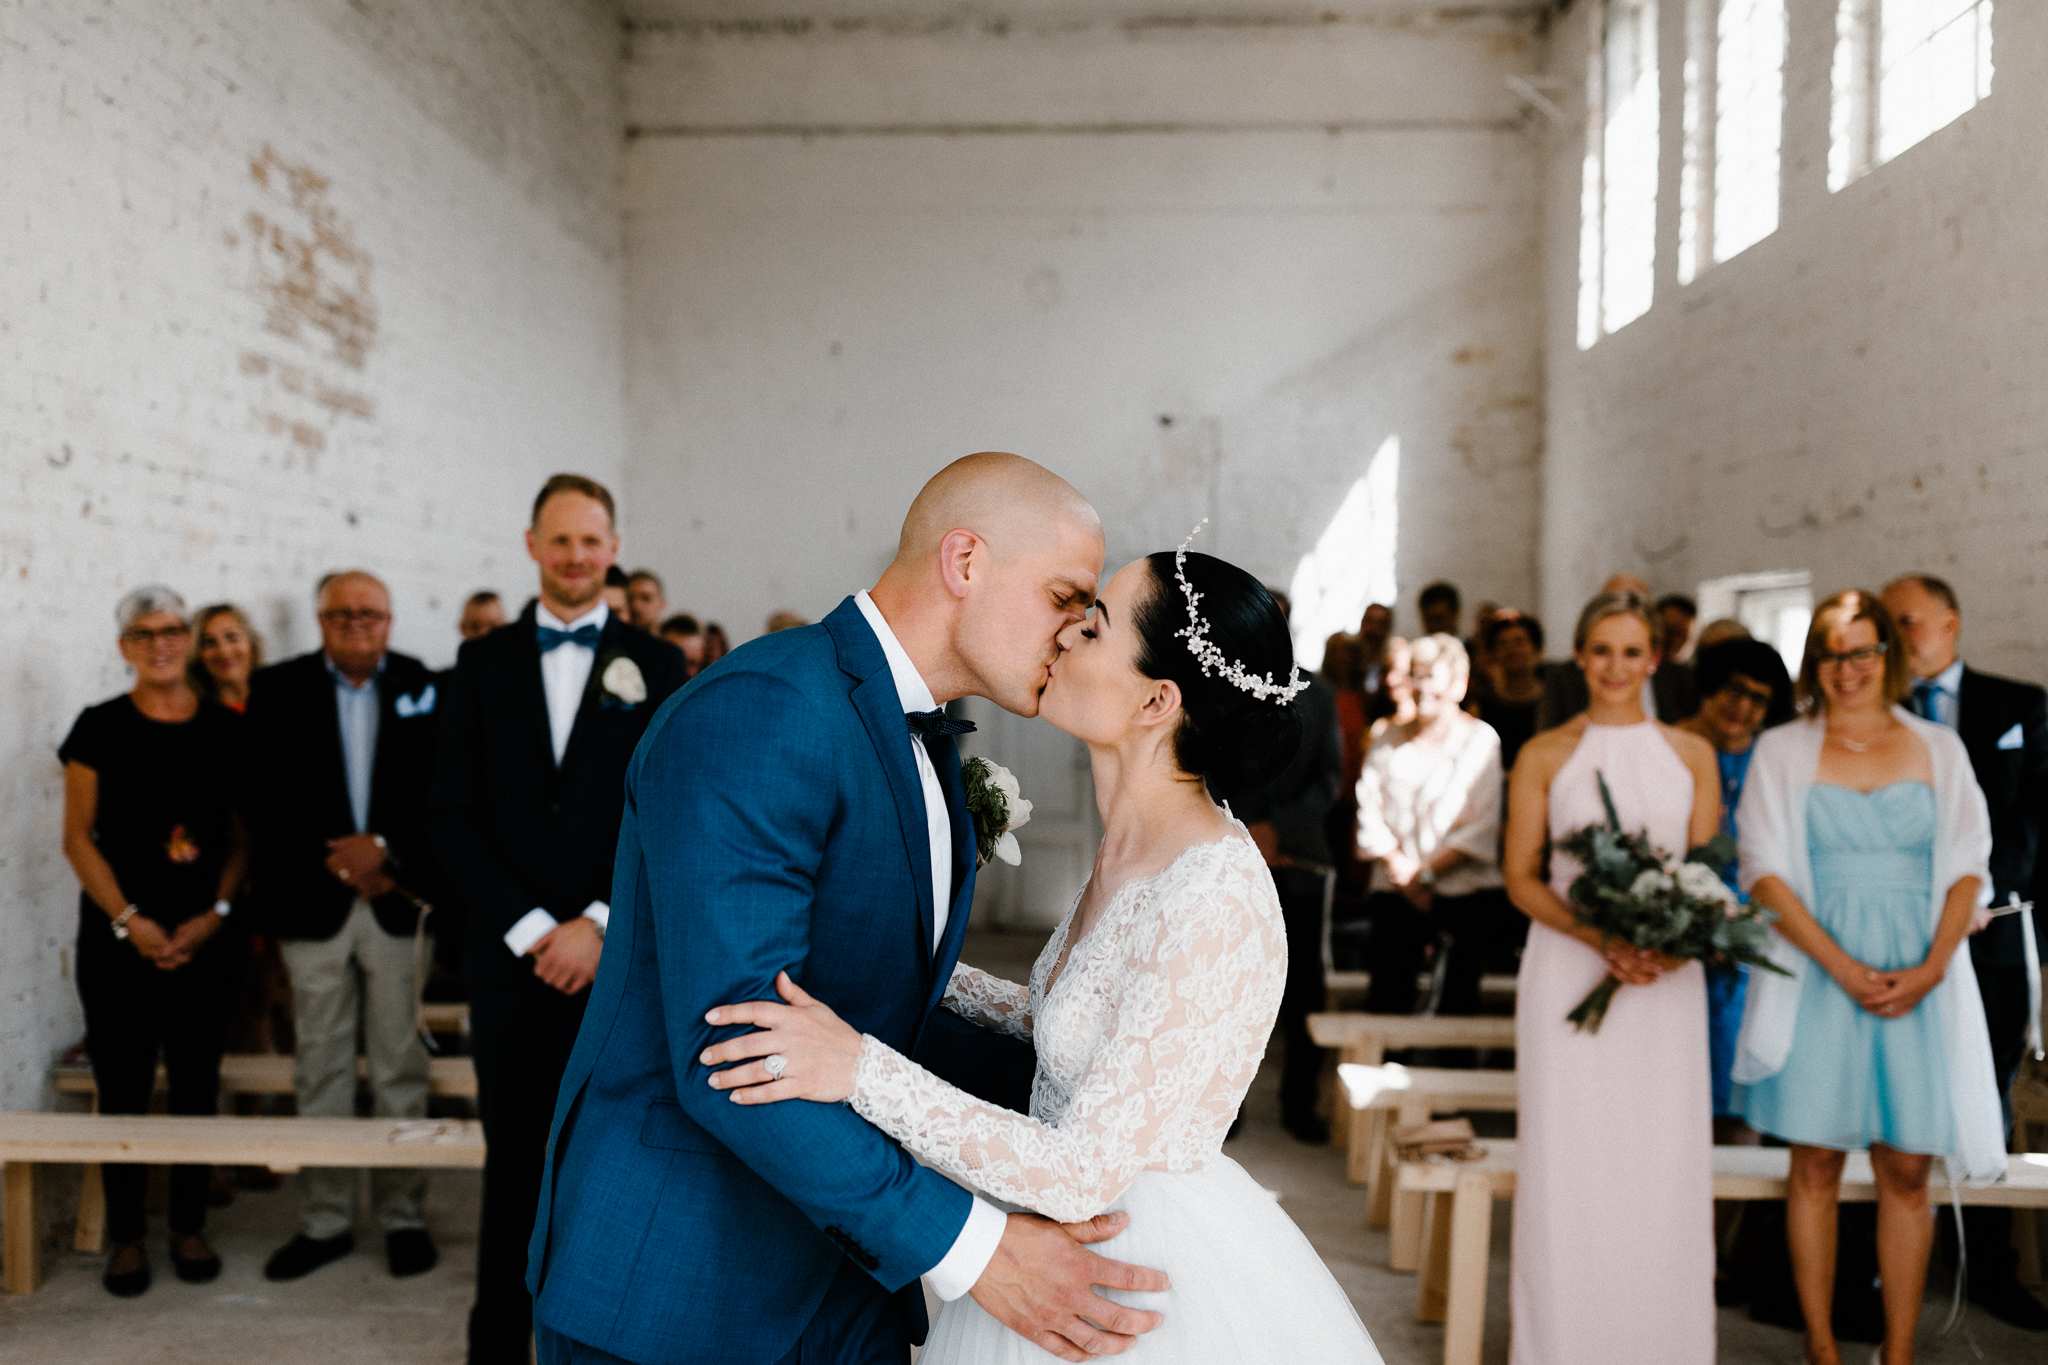 Essi + Ville   Oitbacka Gården   by Patrick Karkkolainen Wedding Photography-158.jpg